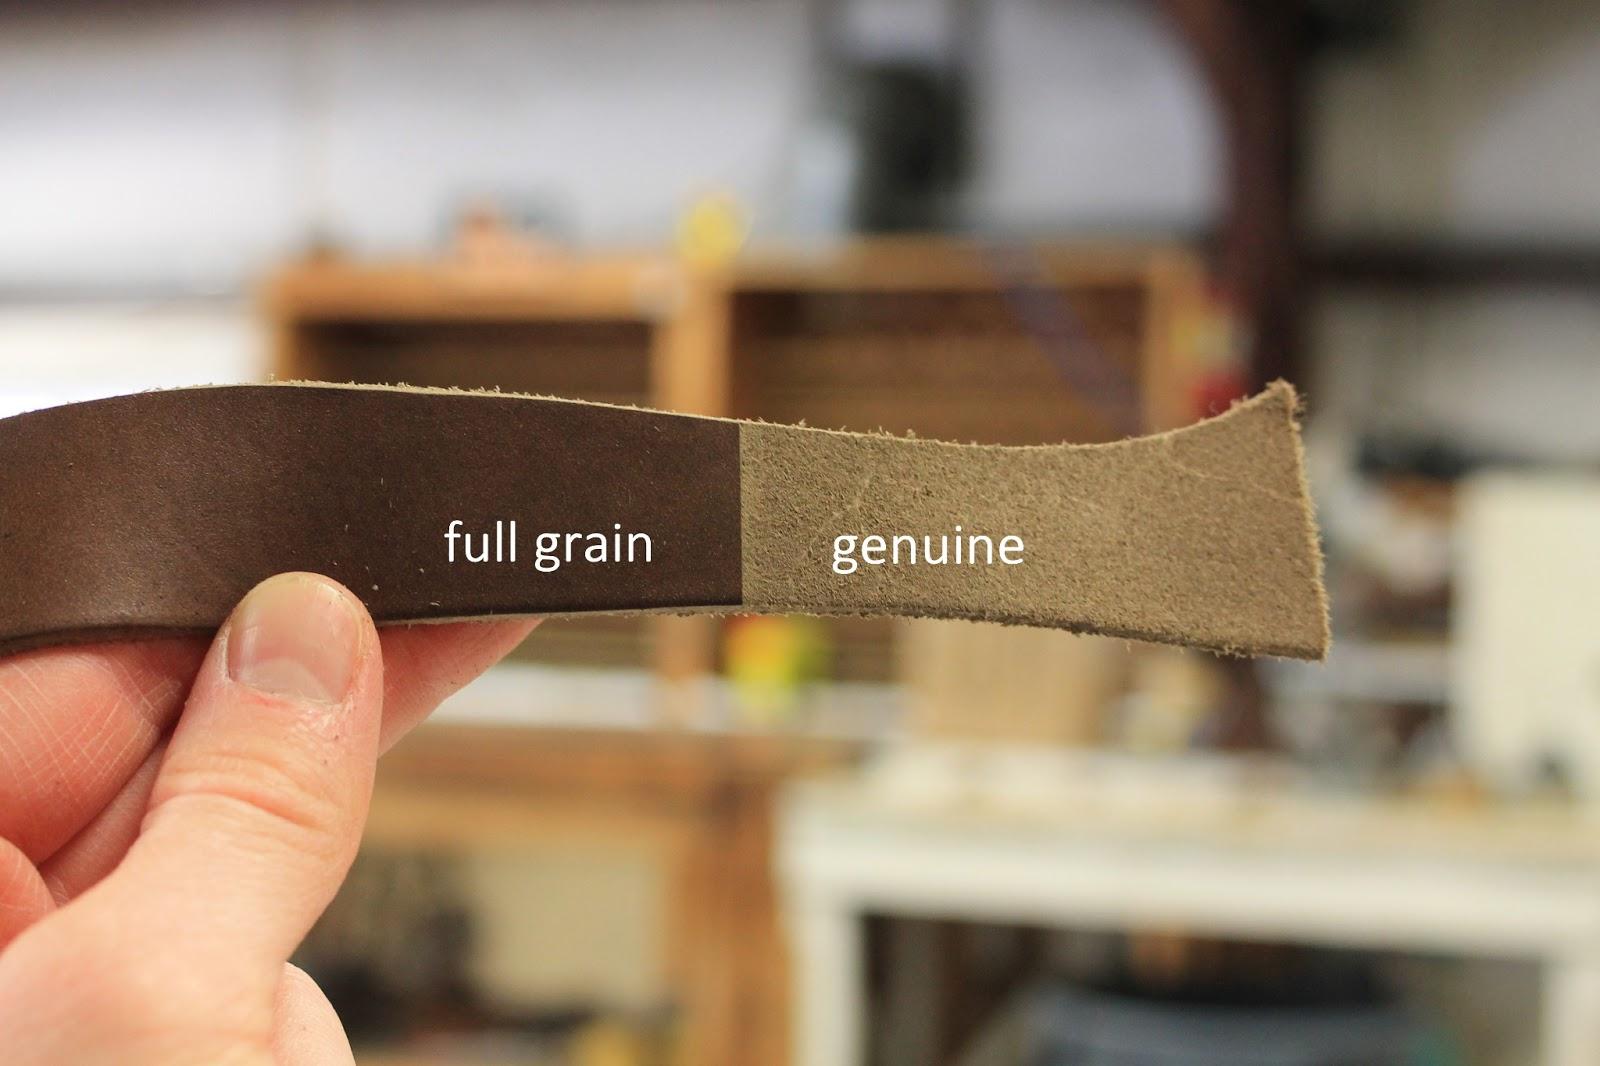 https://cdn.discordapp.com/attachments/287939846662651906/605110595003351060/full-grain-vs--genuine.jpg